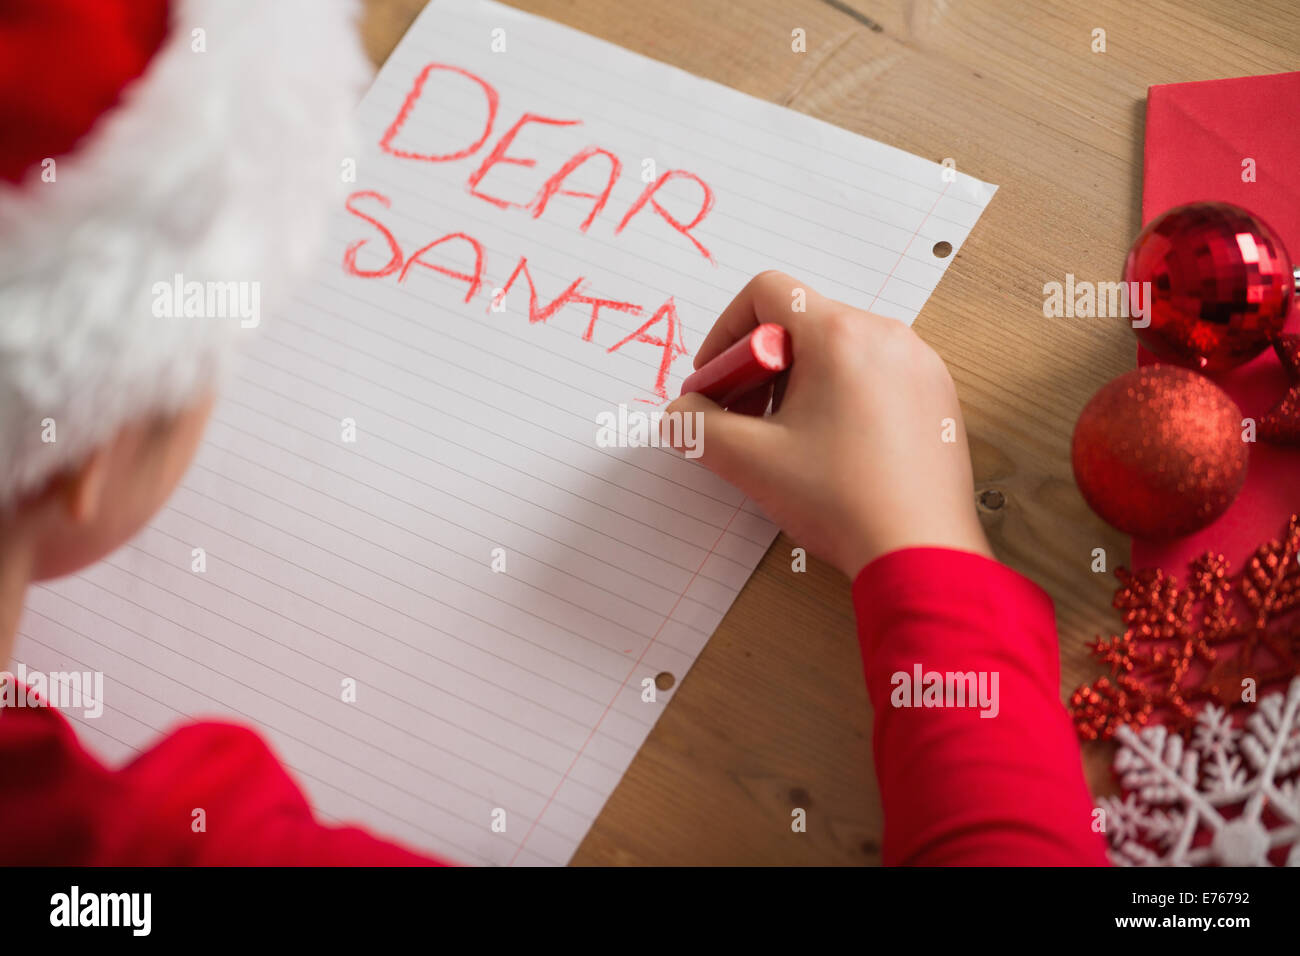 Santa Writing Desk Stock Photos  Santa Writing Desk Stock Images